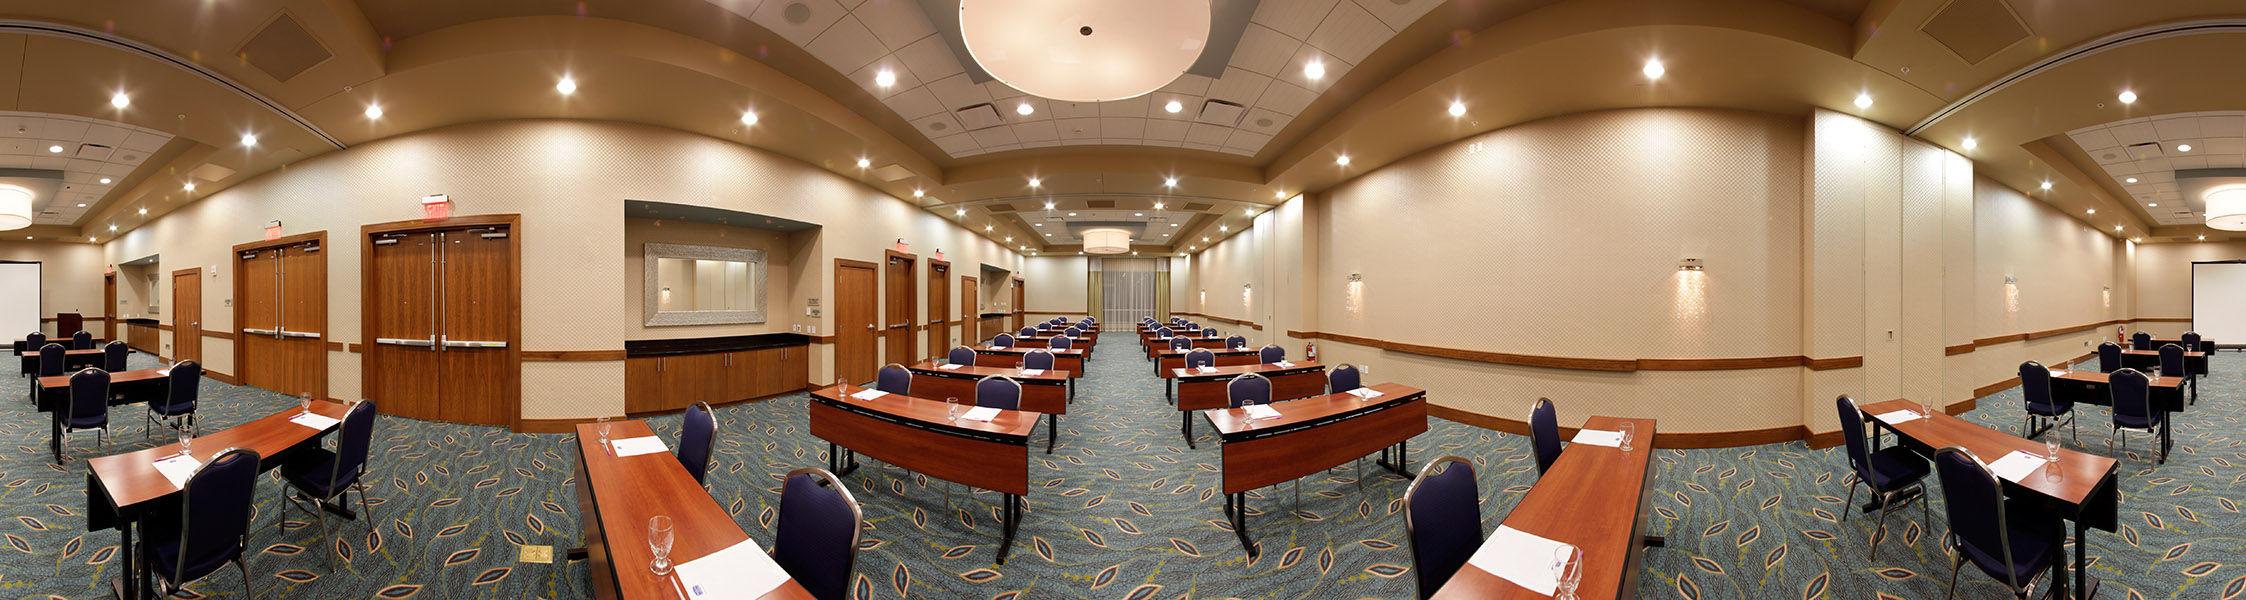 SpringHill Suites by Marriott Las Vegas Convention Center image 12